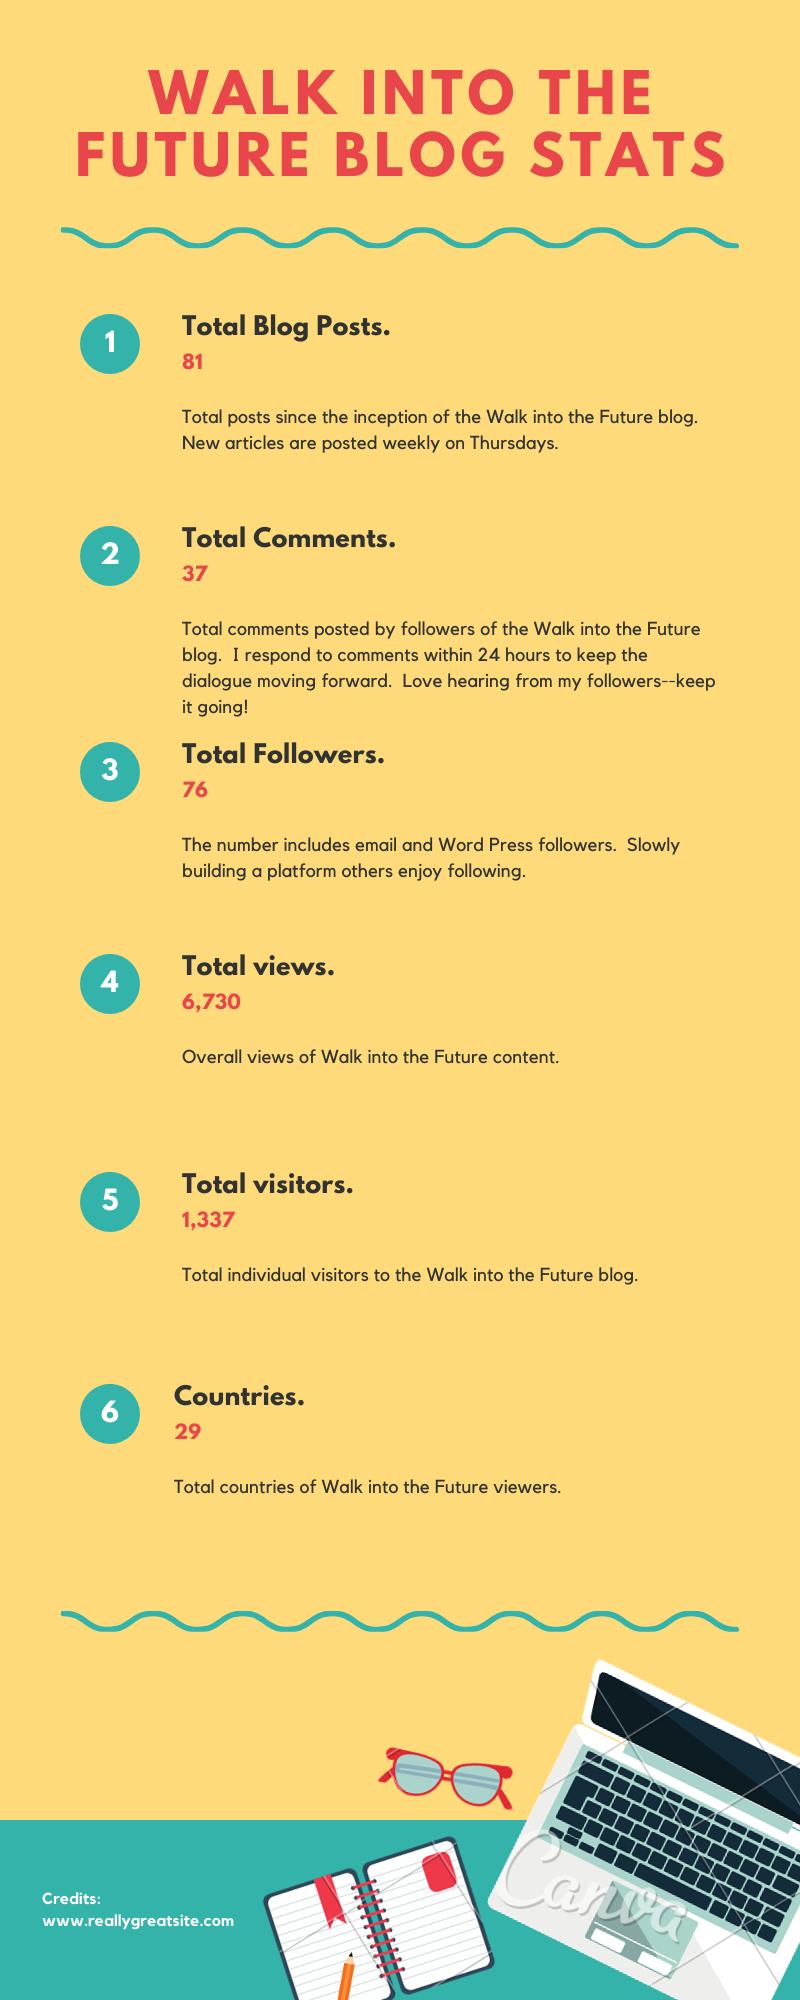 Walk into the future blog stats